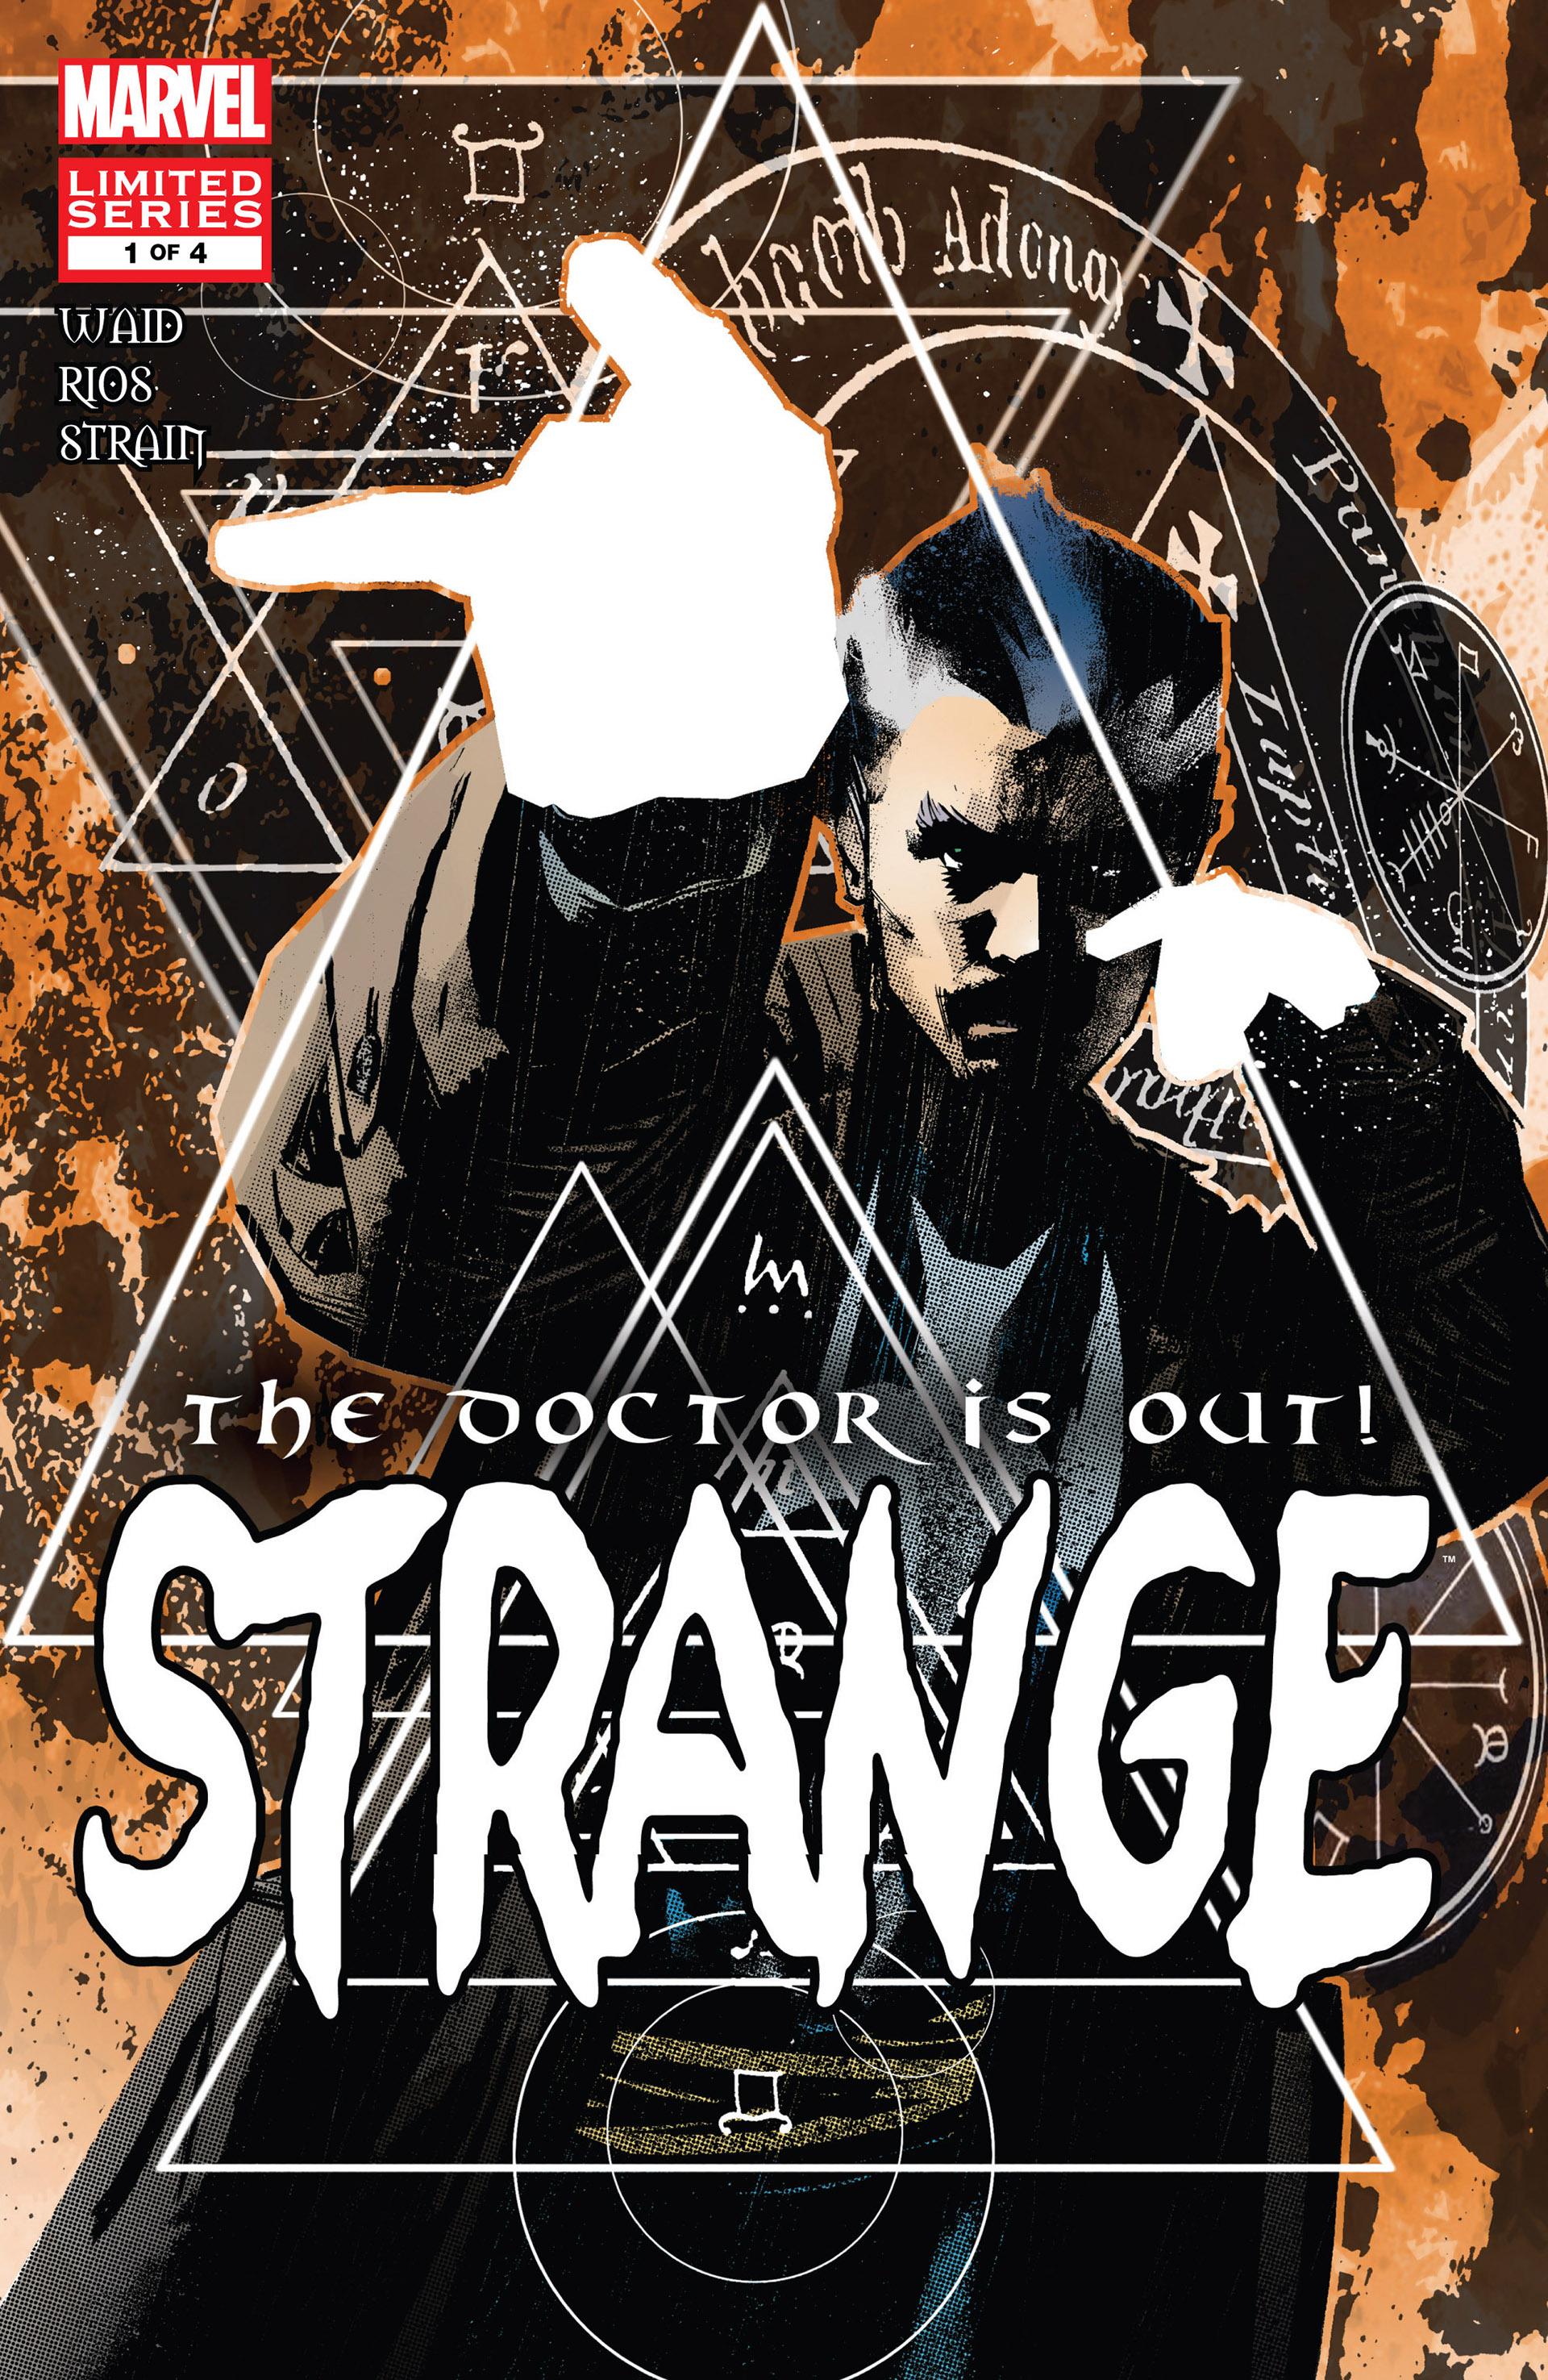 Strange Vol 2 1